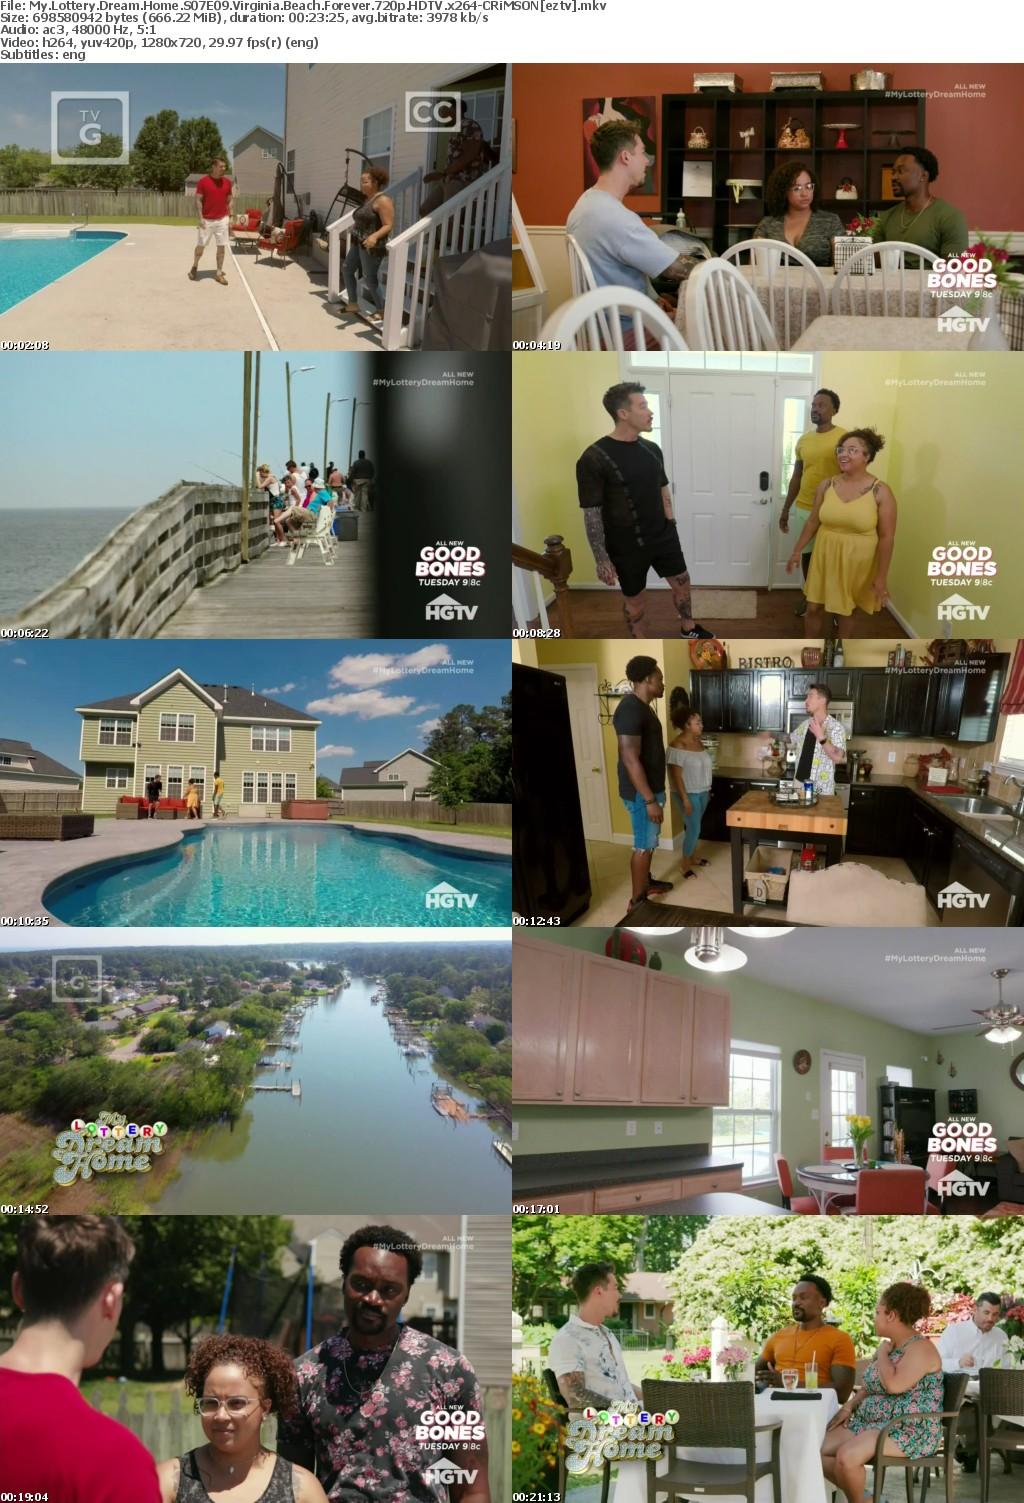 My Lottery Dream Home S07E09 Virginia Beach Forever 720p HDTV x264 CRiMSON